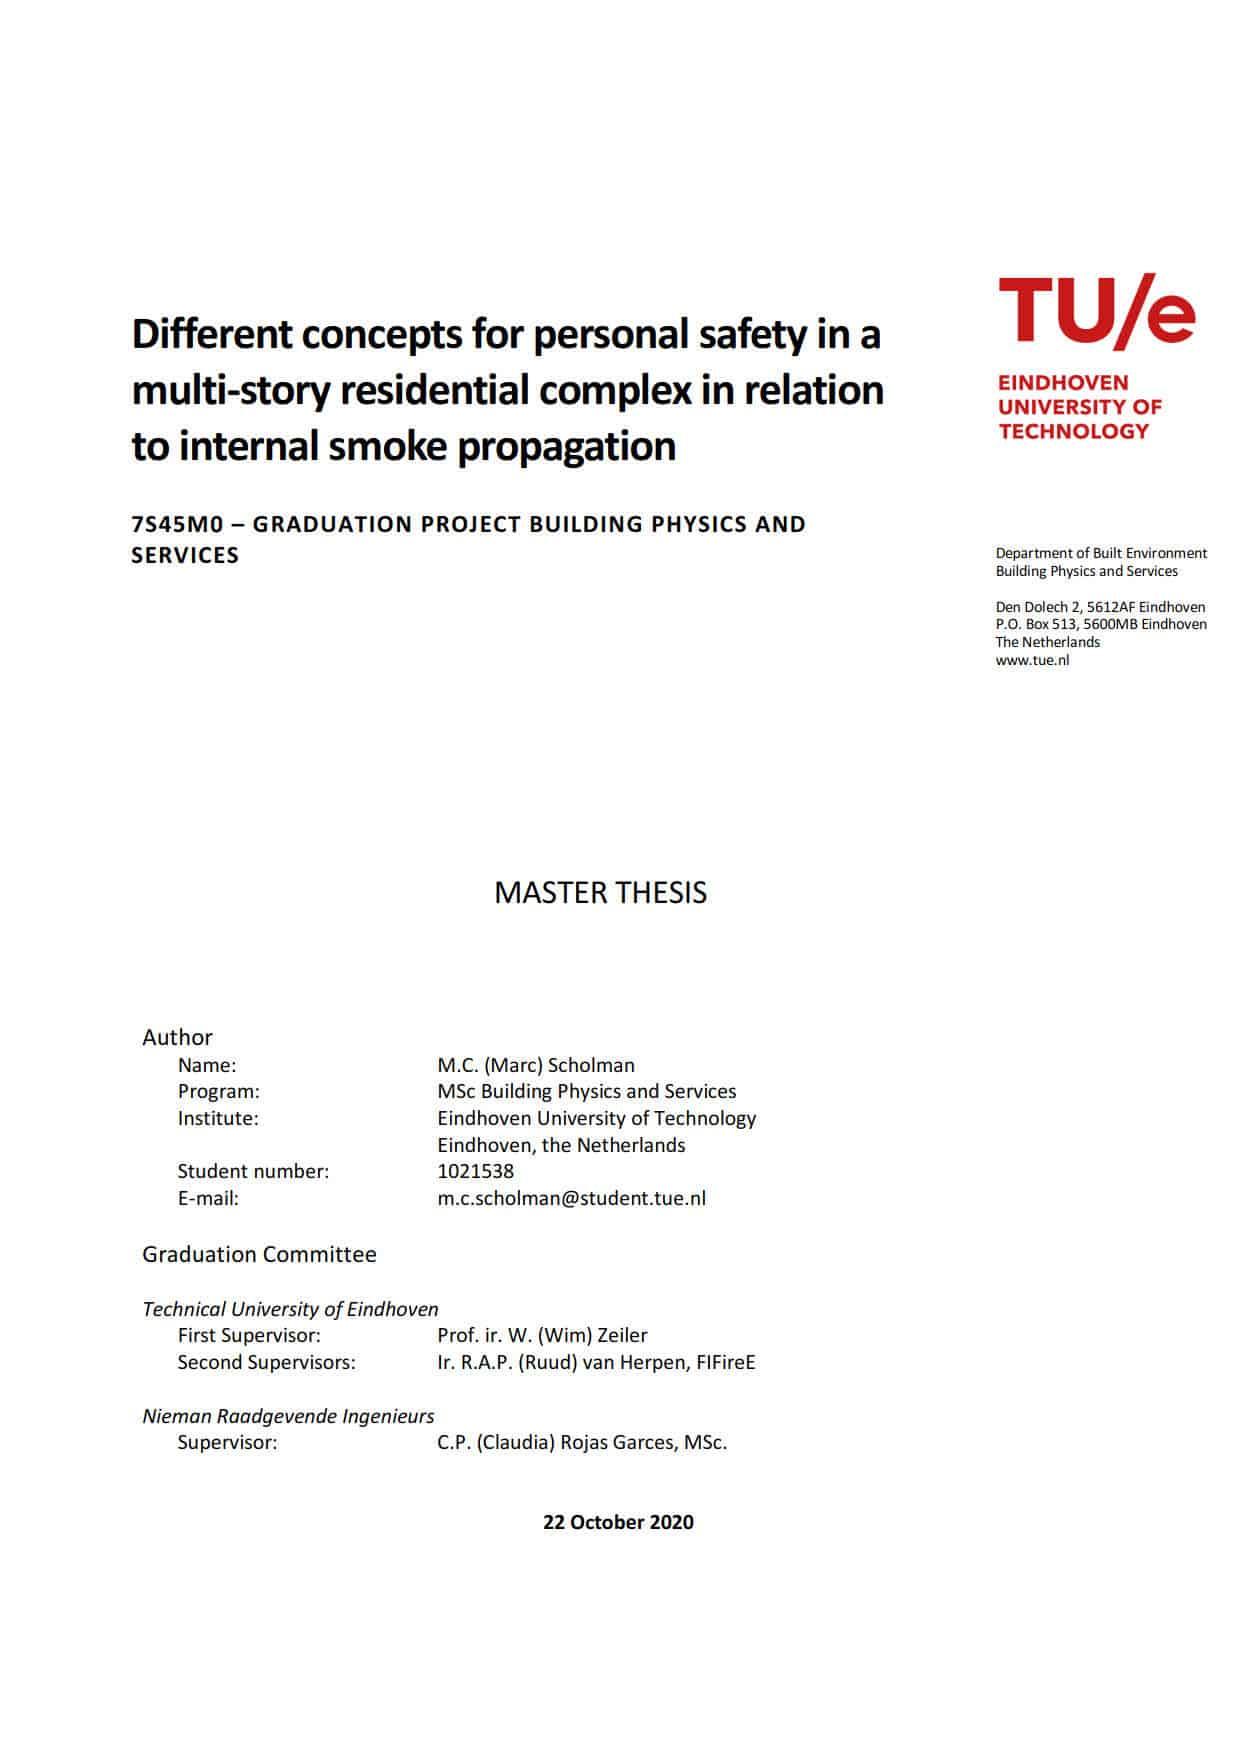 Final thesis Marc Scholman, oktober 2020